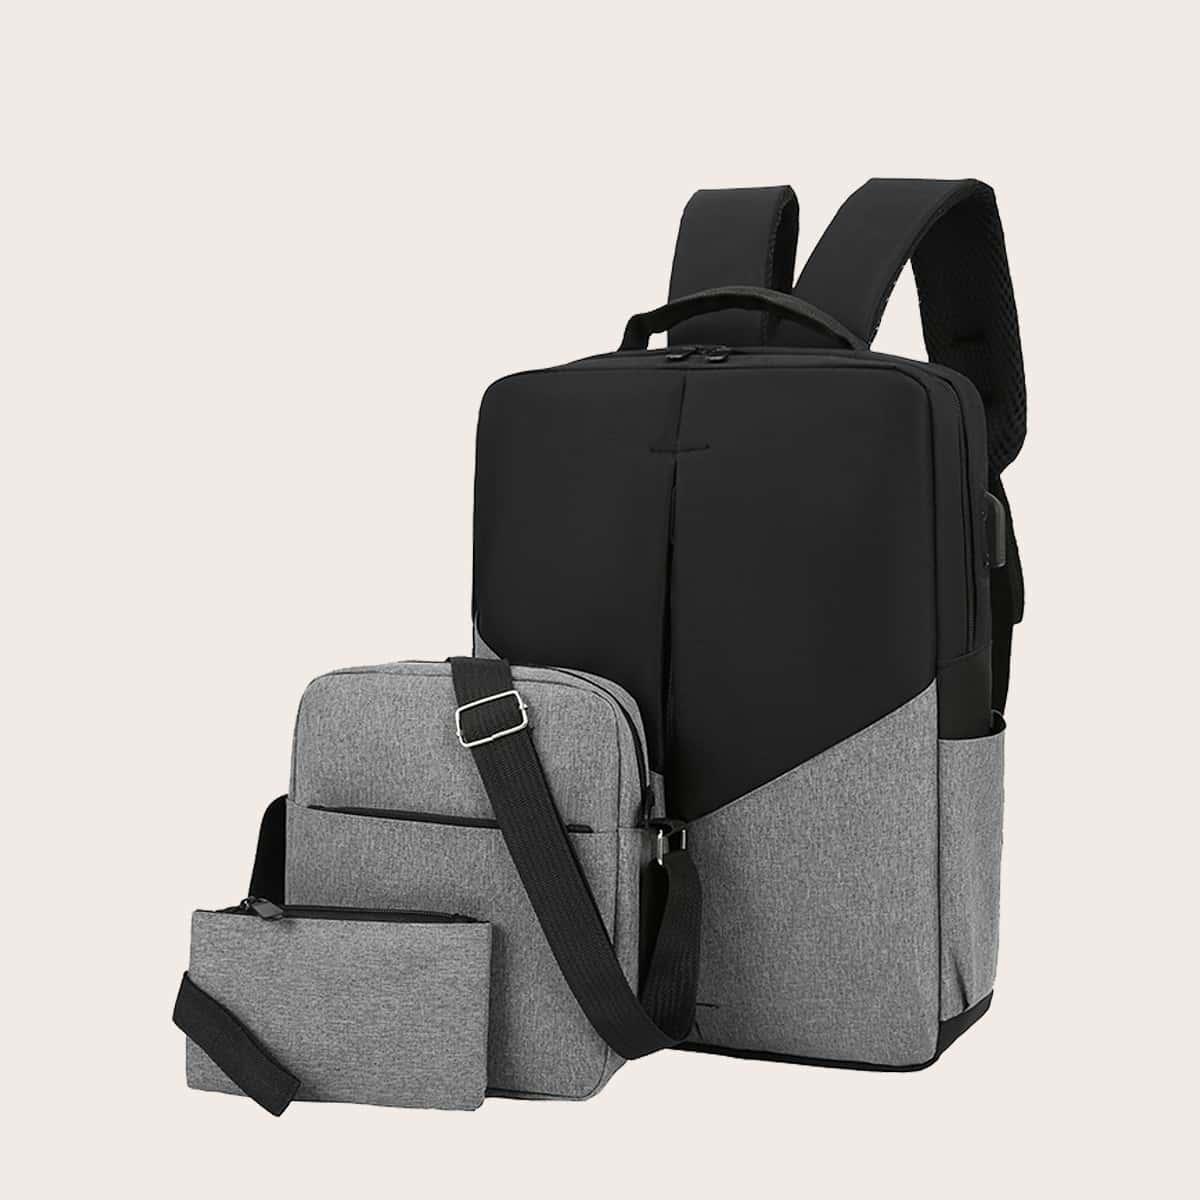 3шт комплект мужского рюкзака от SHEIN